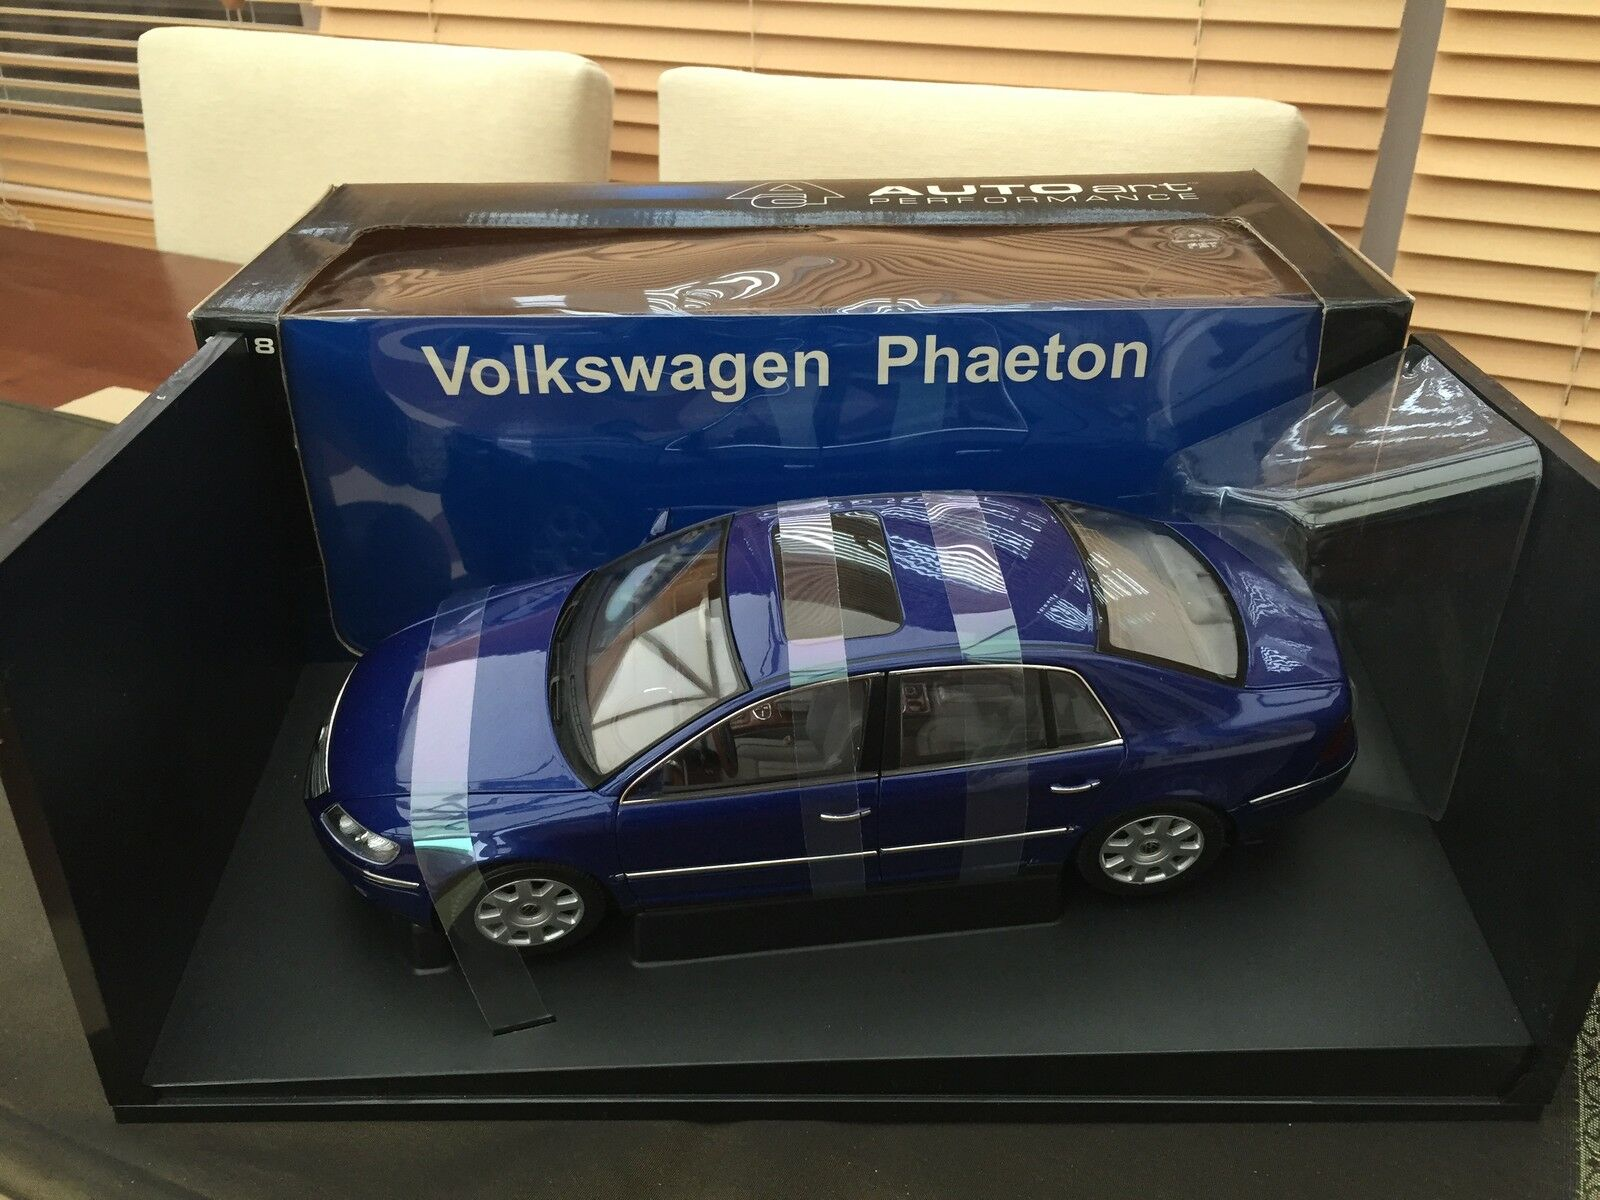 Autoart 1 18 Volkswagon Phaeton in splendida perla blu MOLTO RARO